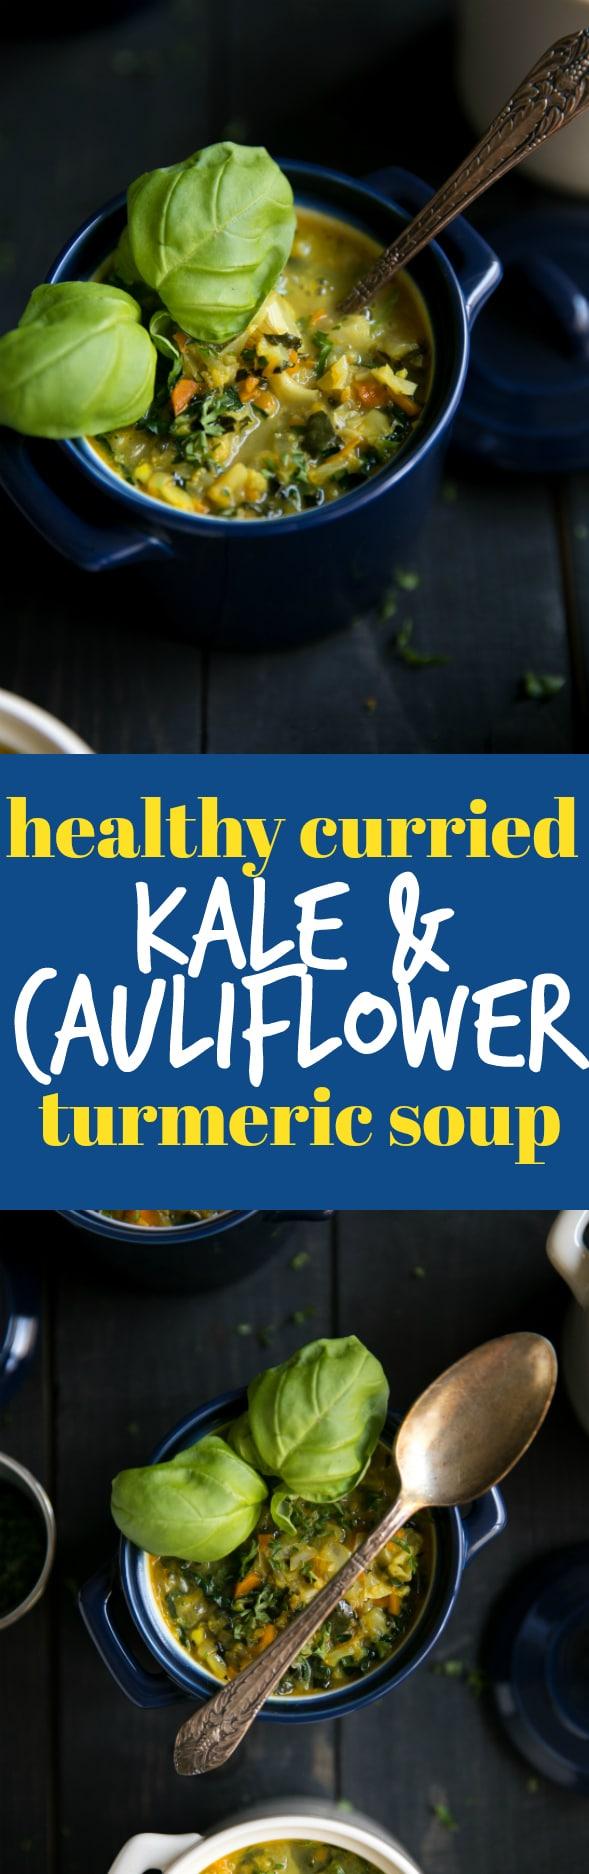 Healthy curried kale and cauliflower turmeric soup #soup #healthy #curry #kale #turmeric #cauliflower #easyrecipe #dinner